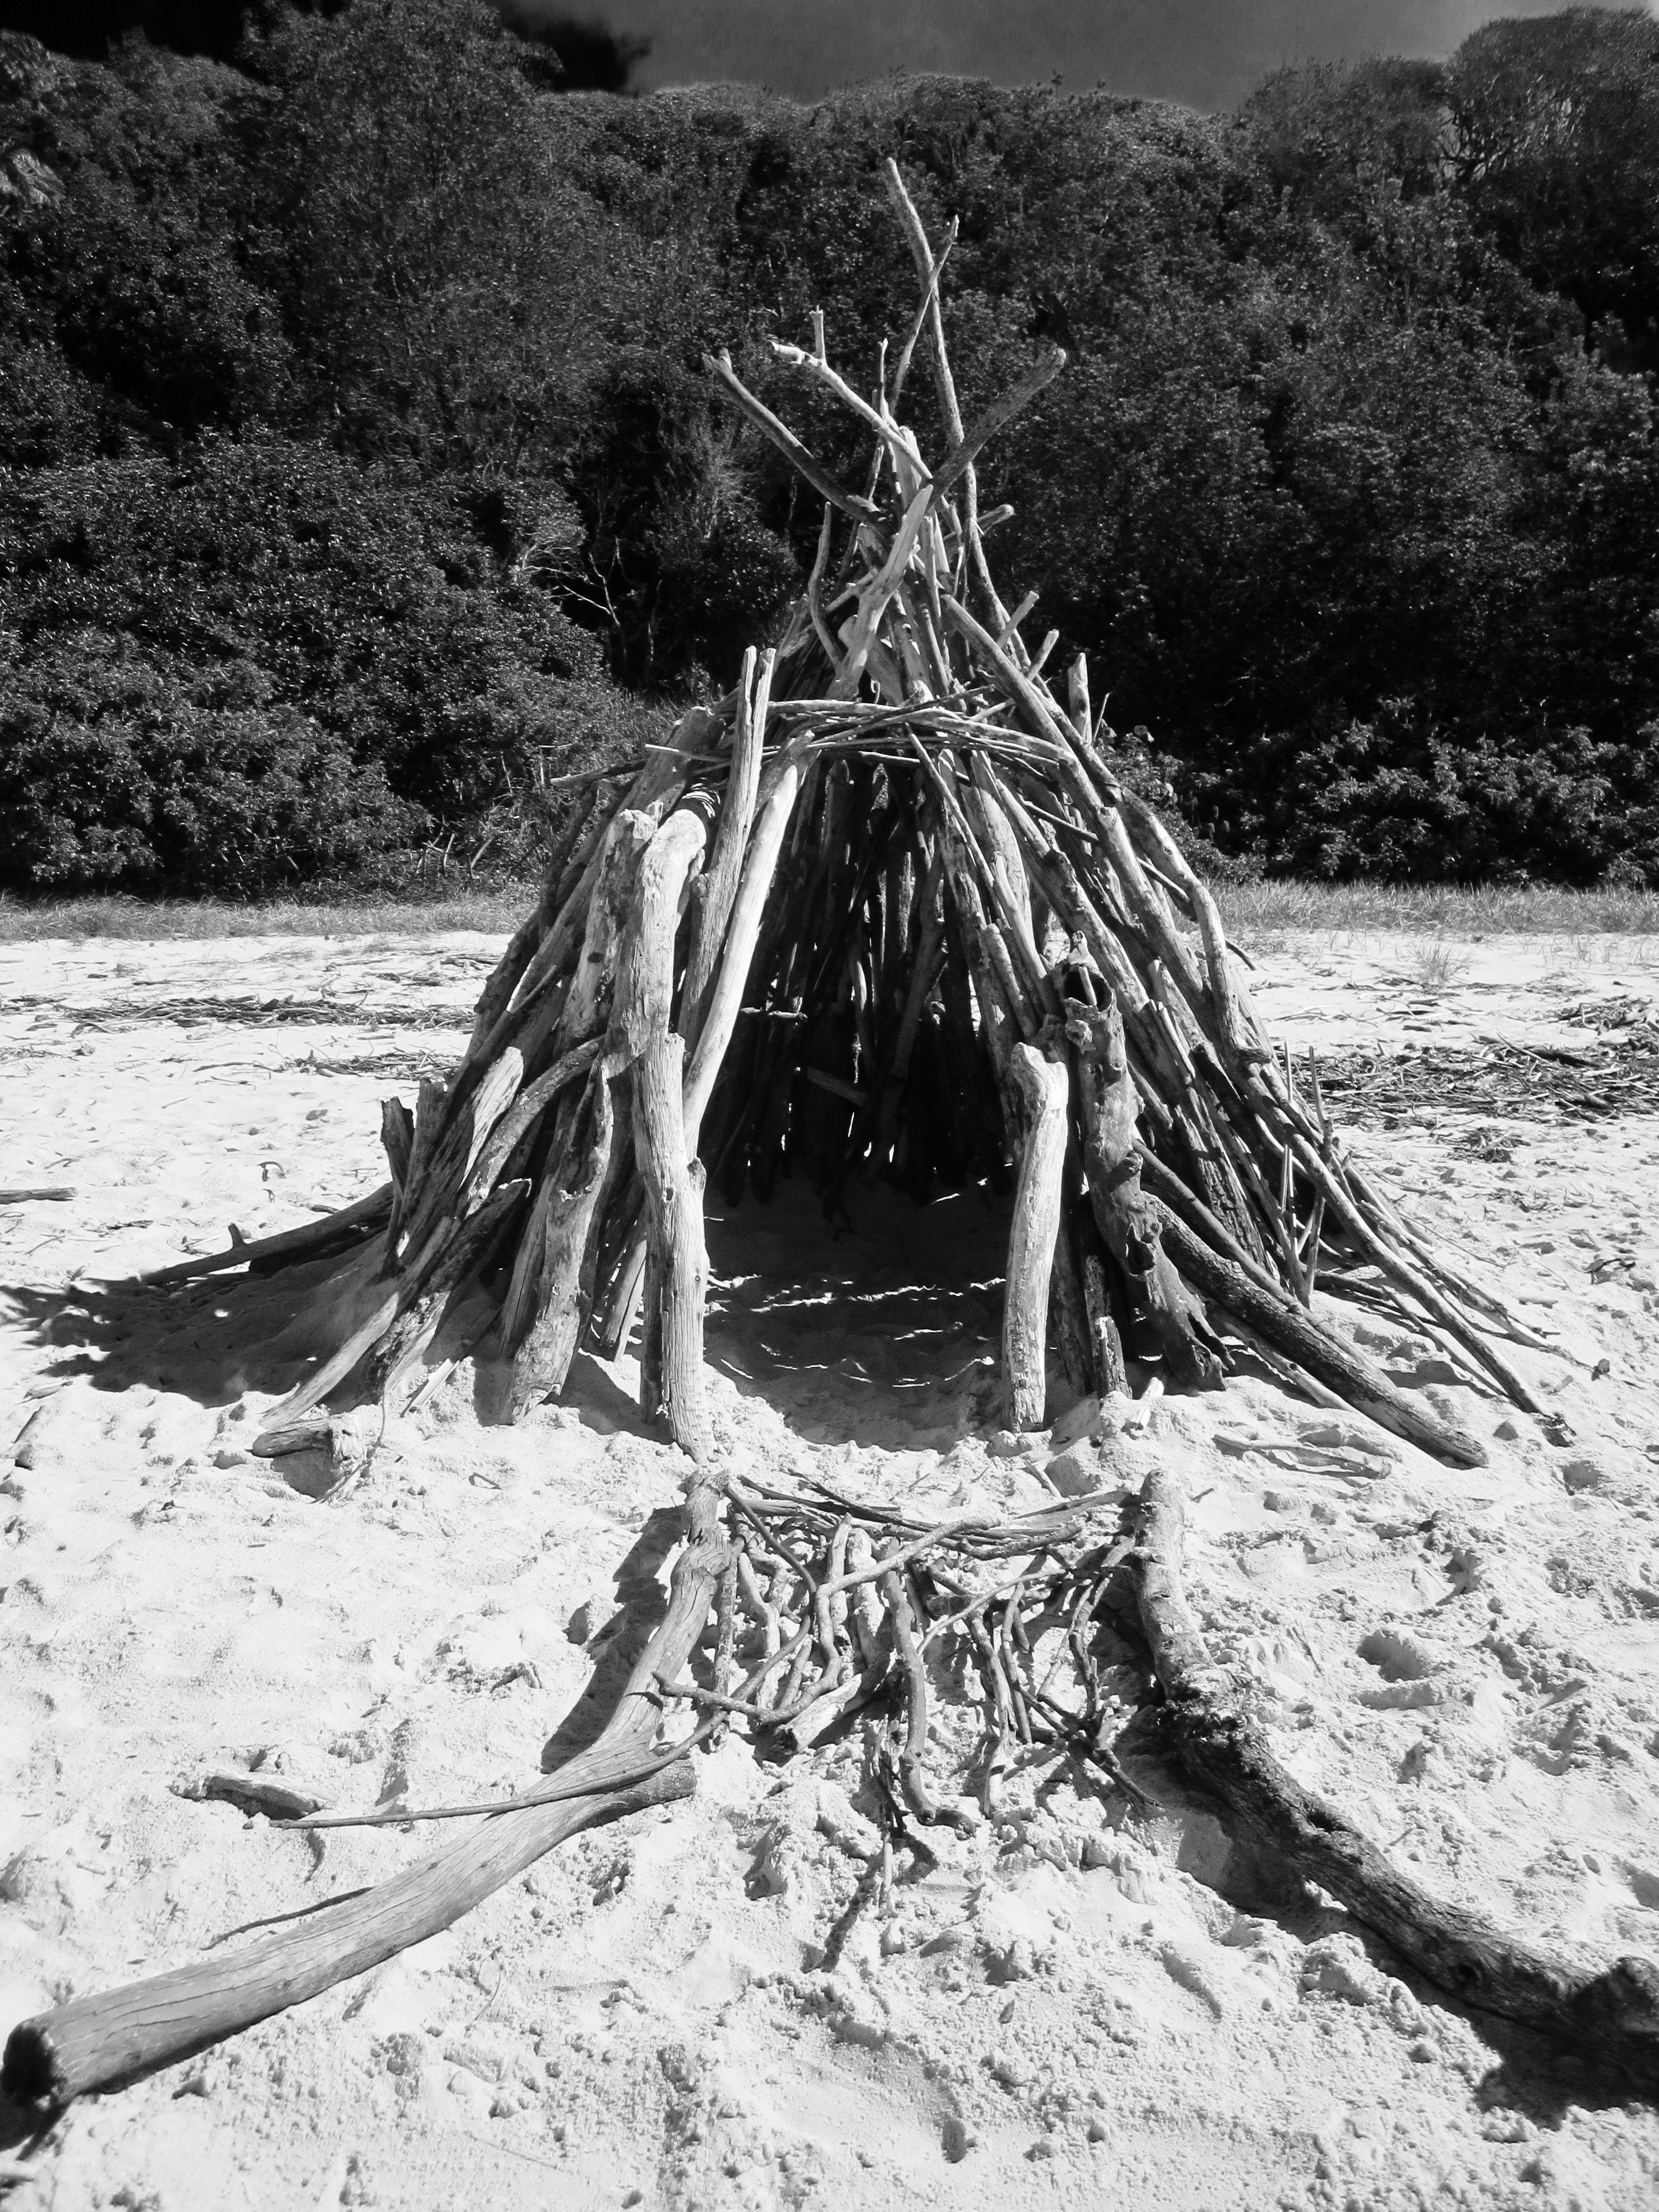 Twig tent on seashore photo